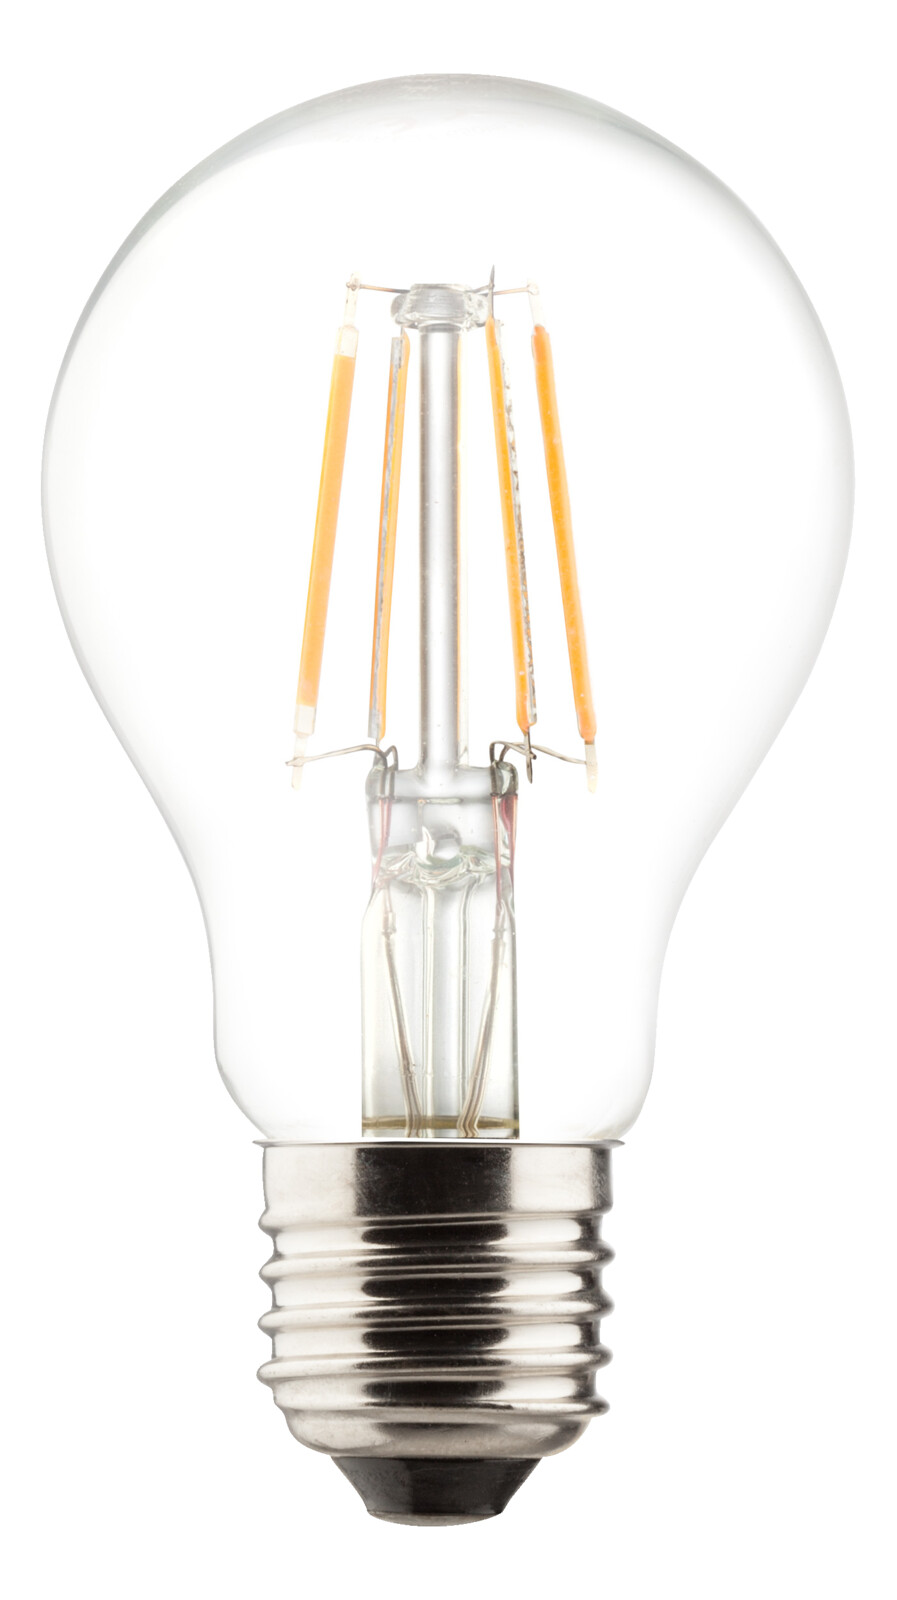 ebay_1600_1600_jpeg Wunderschöne Led Leuchtmittel E27 1000 Lumen Dekorationen